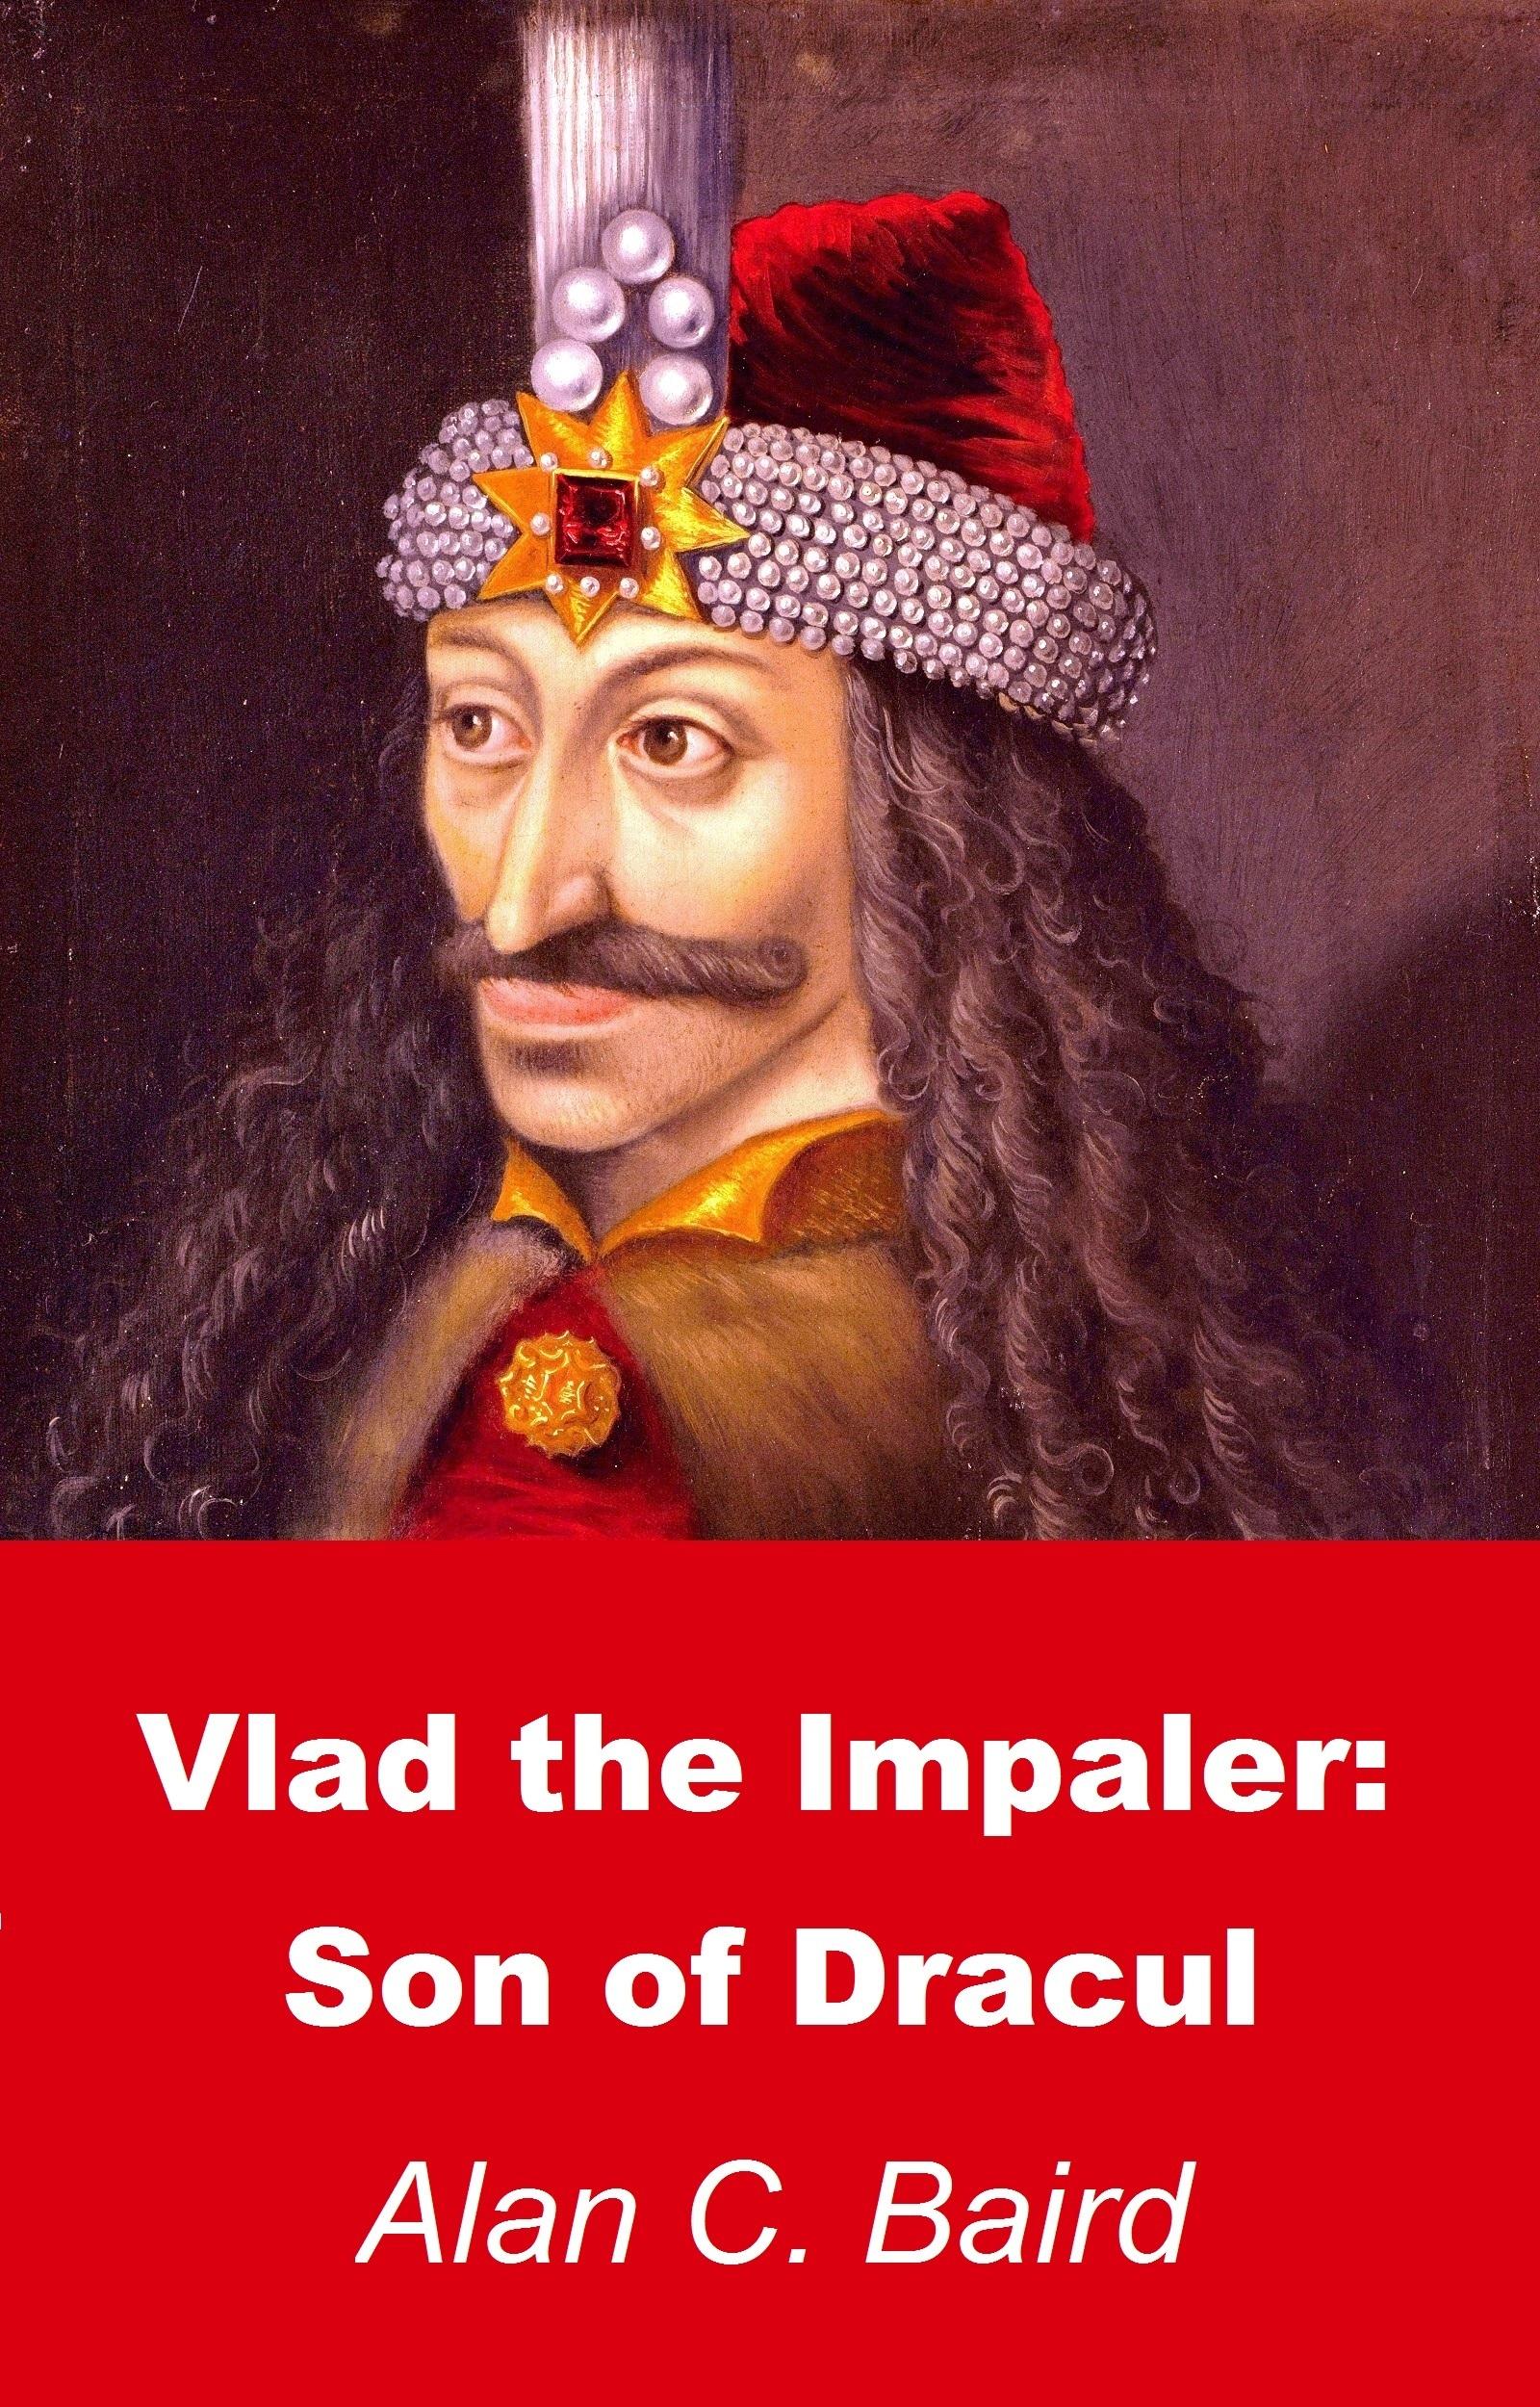 Vlad the Impaler: Son of Dracul Alan C. Baird